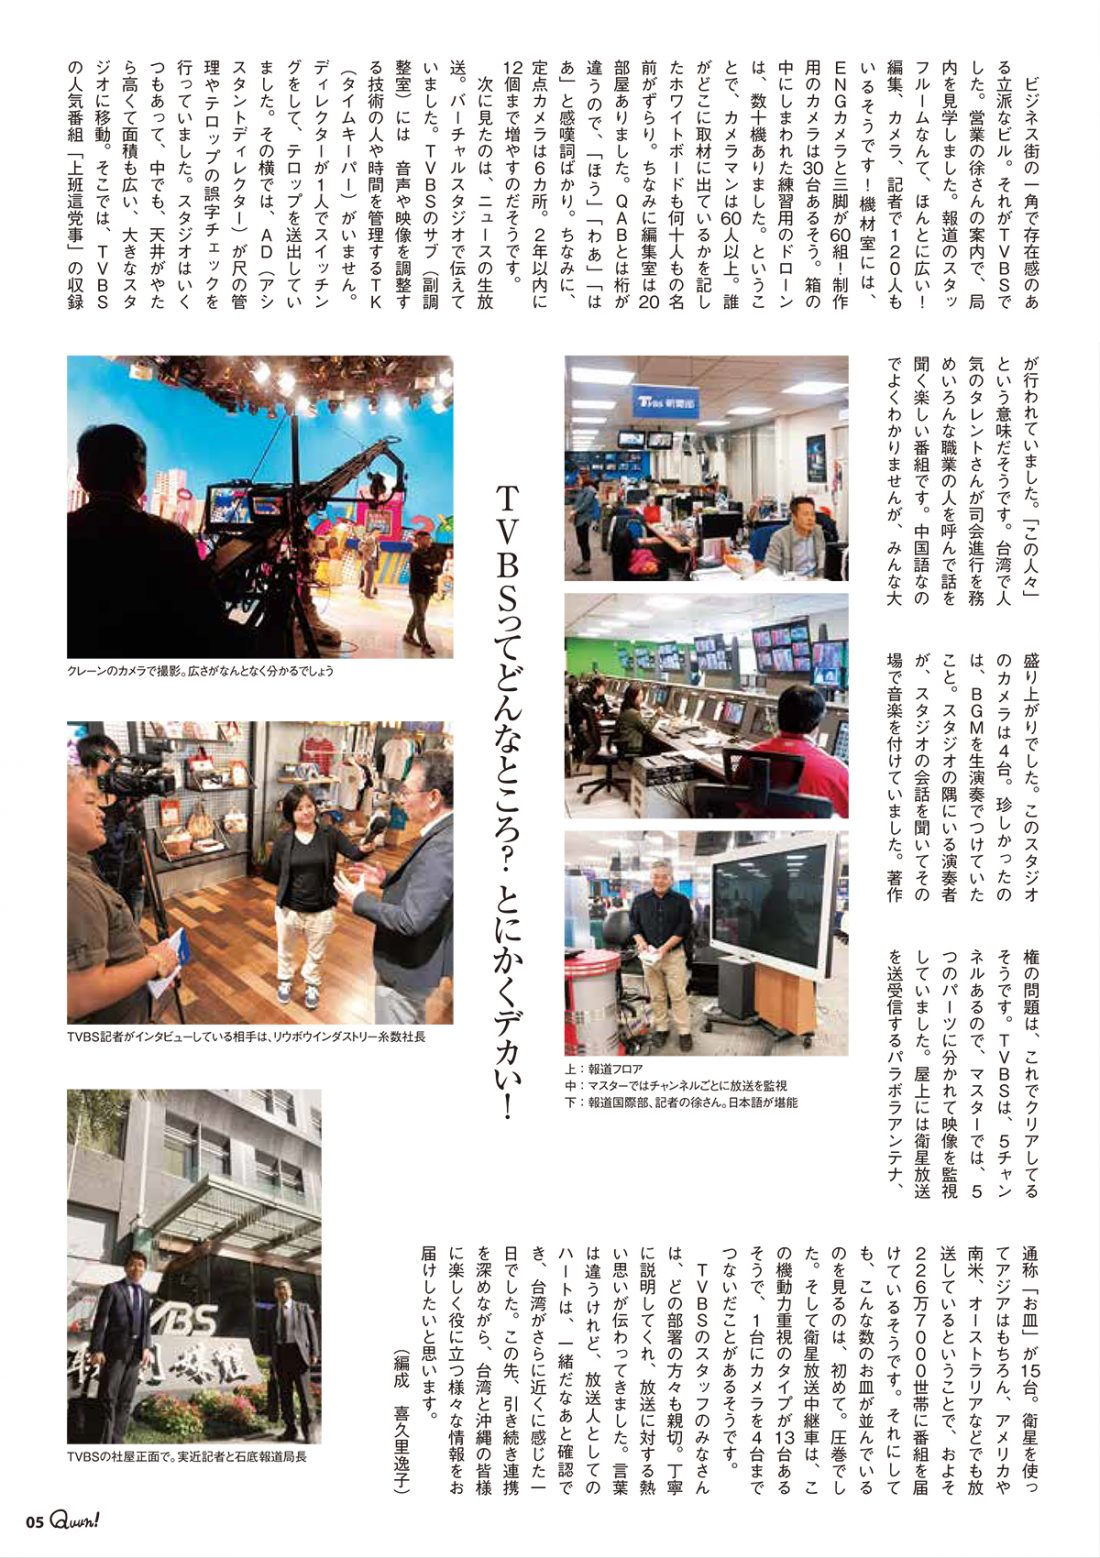 https://www.qab.co.jp/qgoro/wp-content/uploads/quun_0907-1100x1558.jpg